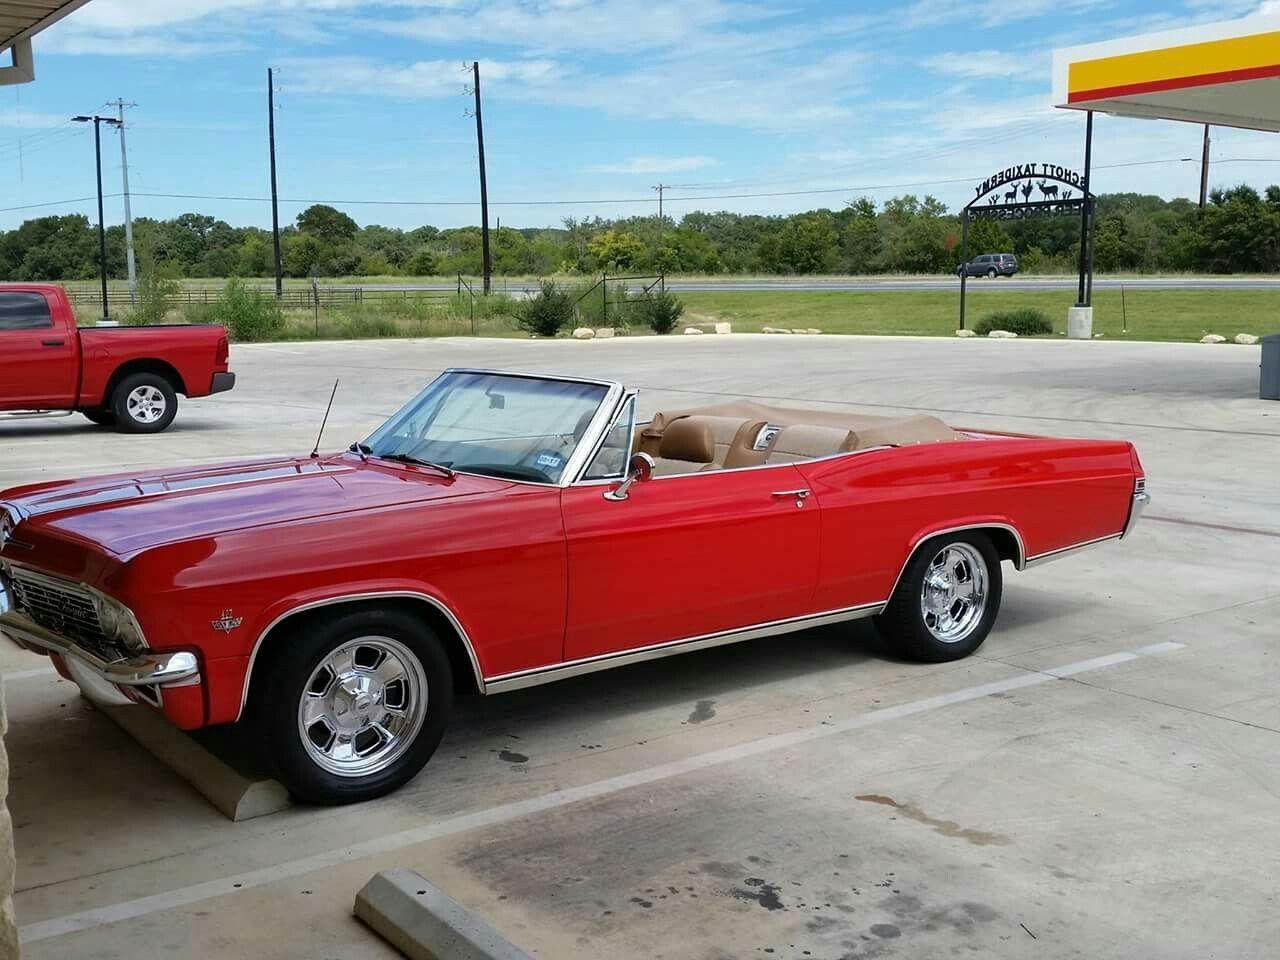 Cars and more chevy impala chevy impalas vehicles drag racing racing - Chevrolet Impala Convertible